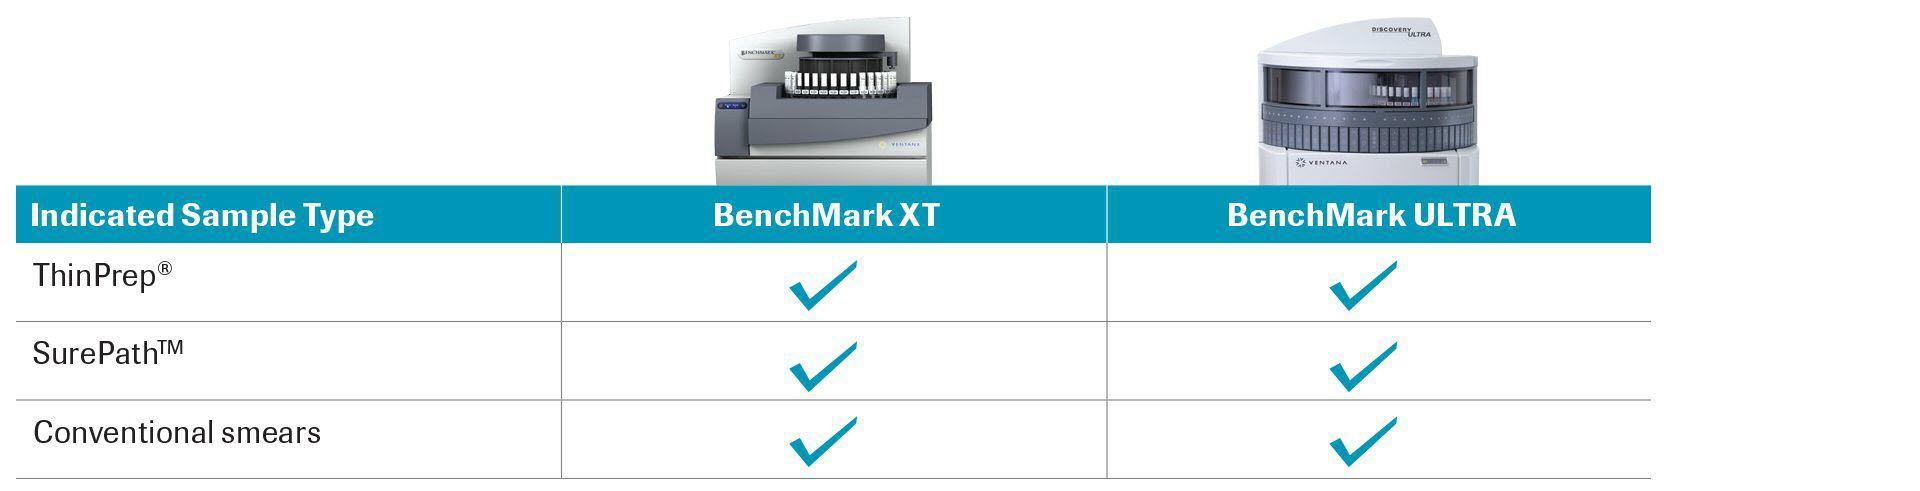 BenchMark_Lineup_chart